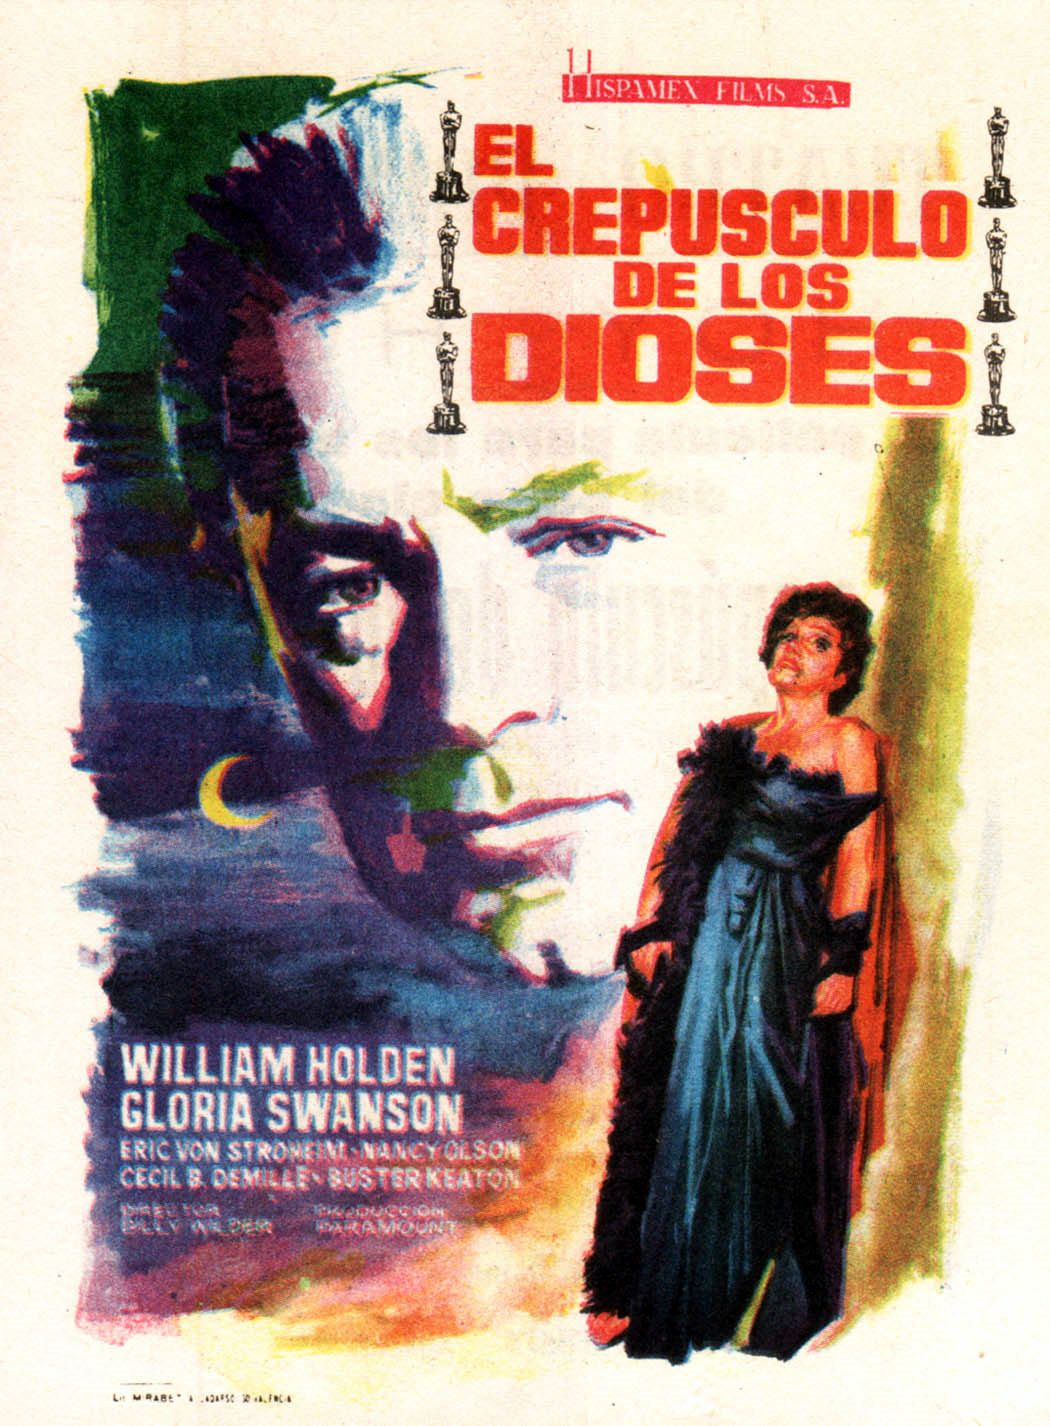 sunset blvd6 Film noir, Noir movie, Full movies online free